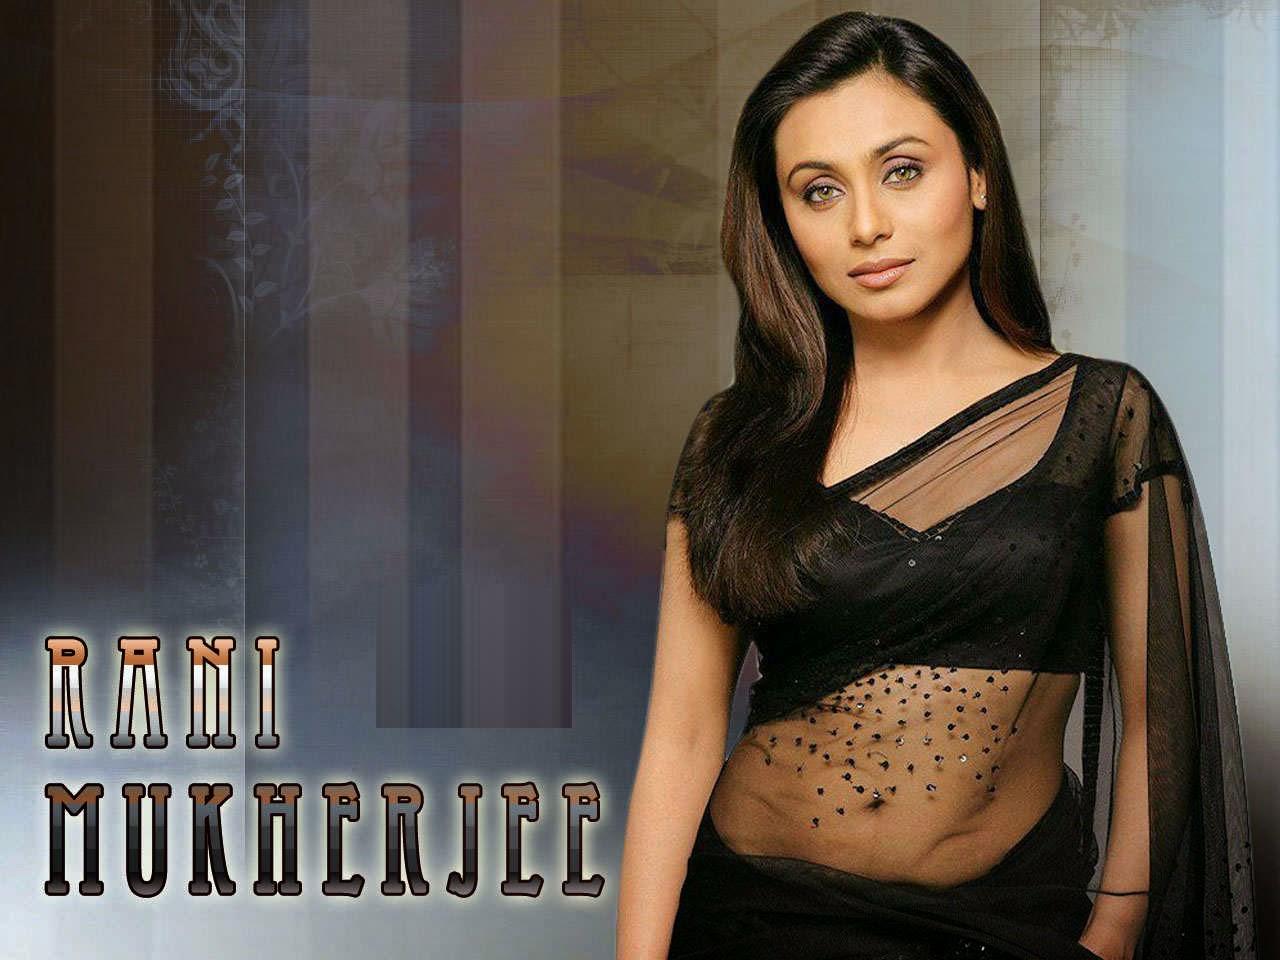 Rani mukherjee hd wallpapers